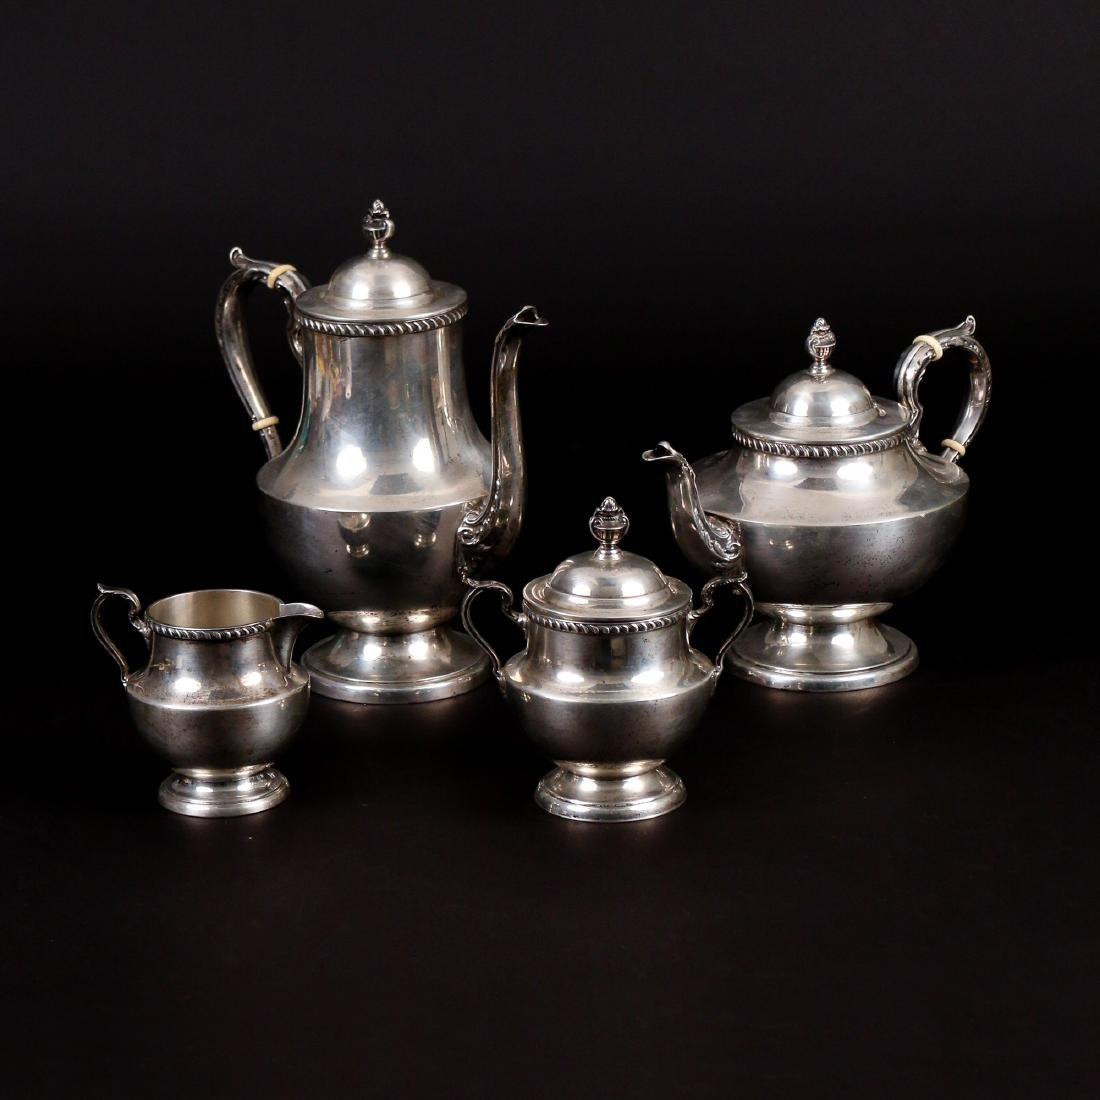 (4pc) POOLE STERLING SILVER TEA SERVICE